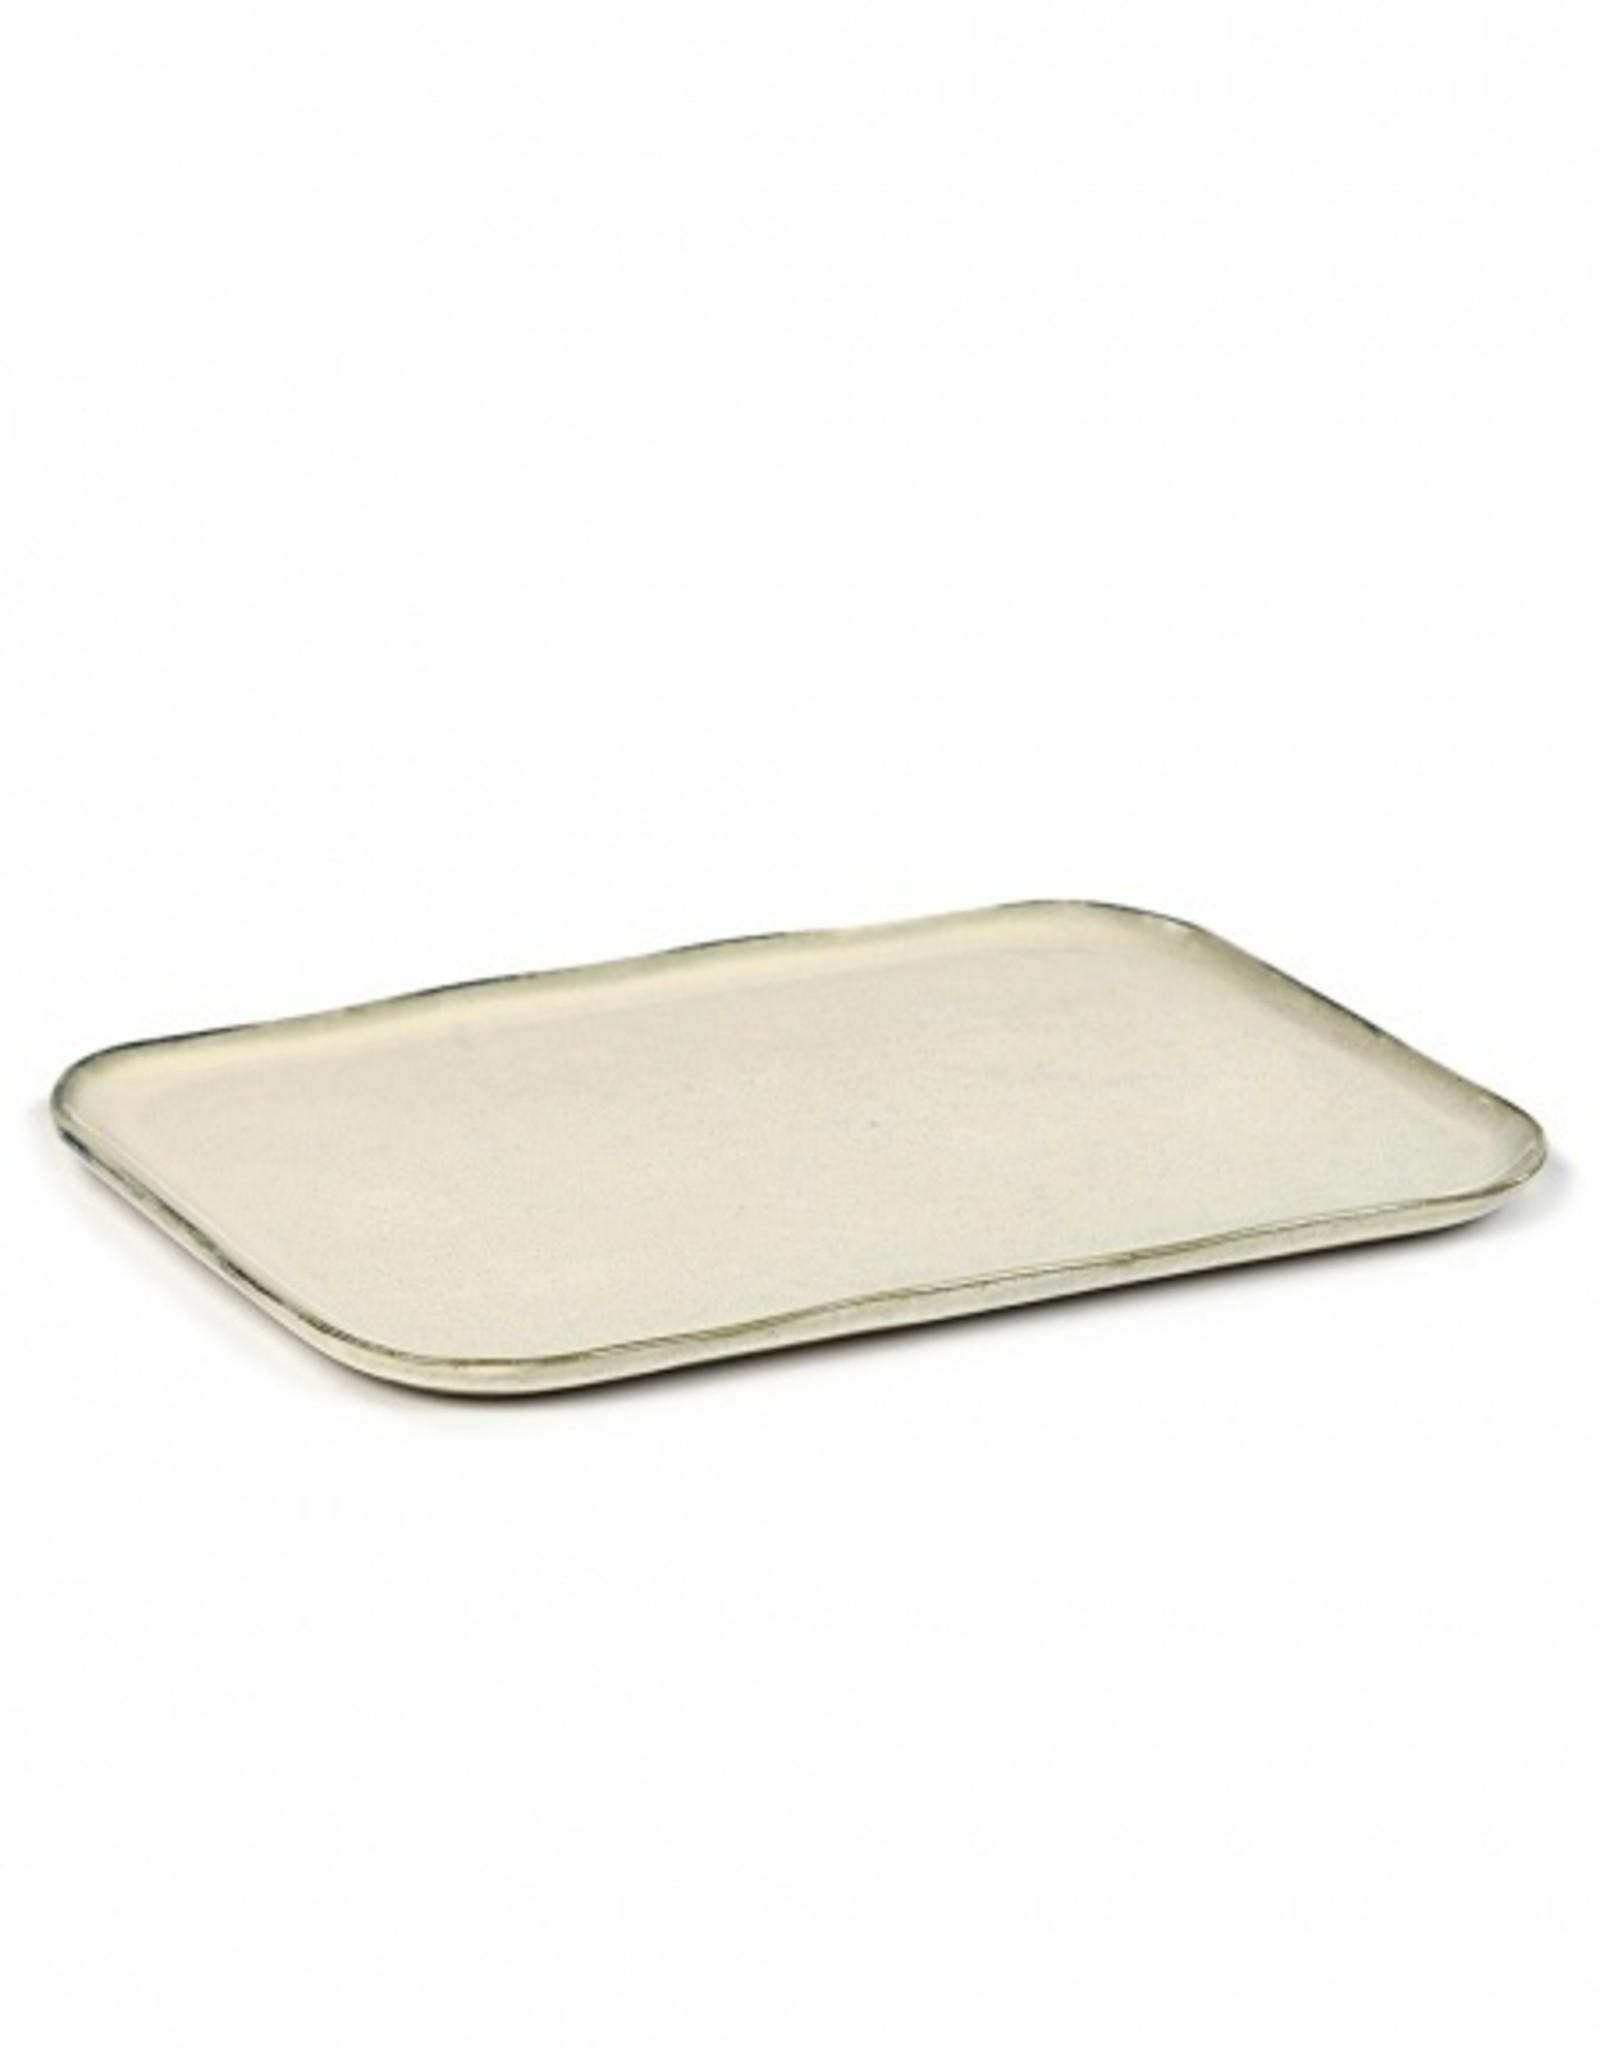 Serax Off White Sandstone No 1 Rectangular Plate